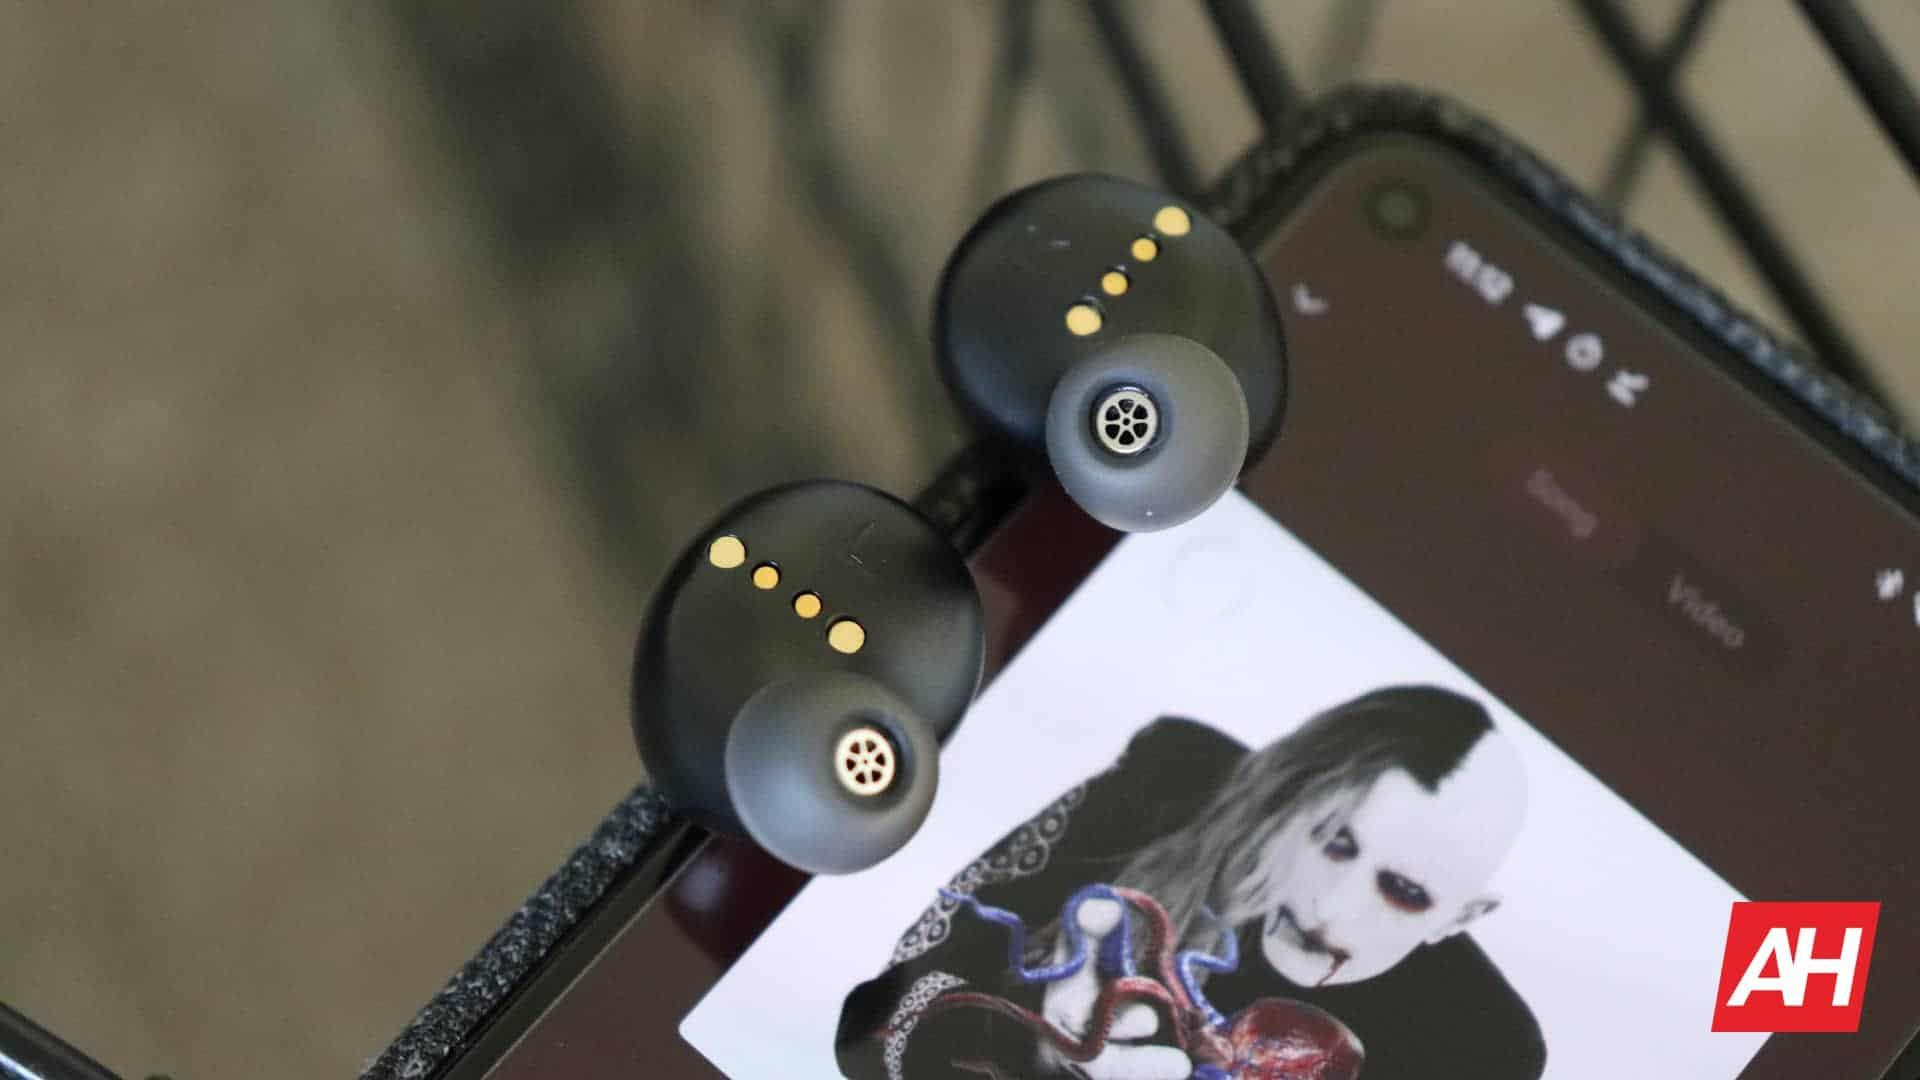 03 EarFun Free 2 audio DG AH 2021